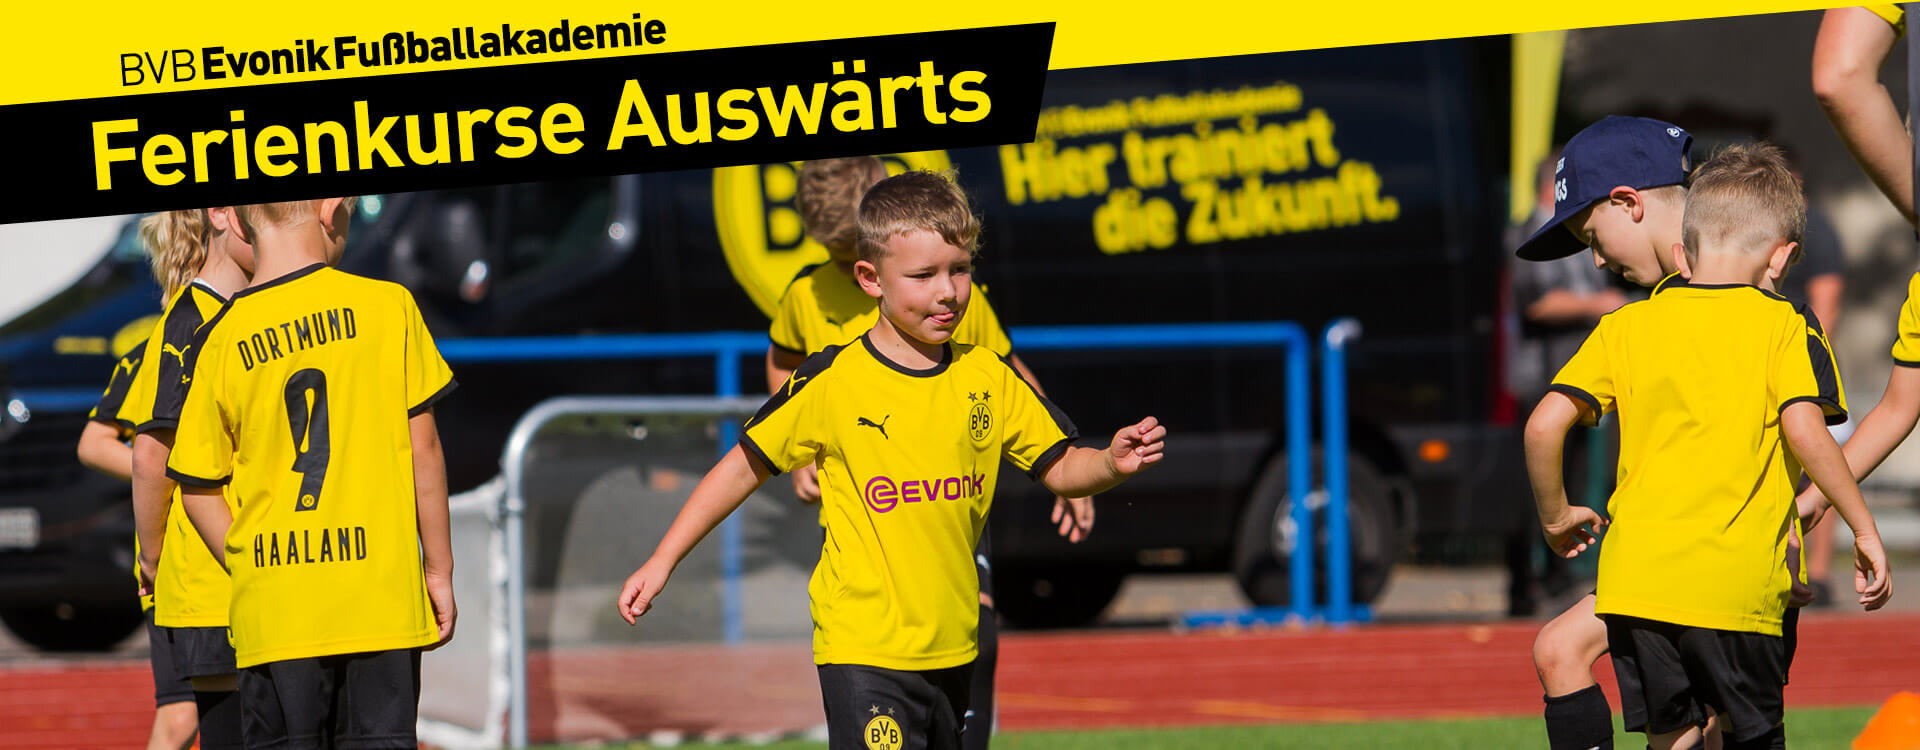 Onlineshop_Kategoriebuehnen_DT_1920x750_FBA_Ferien_Ausw